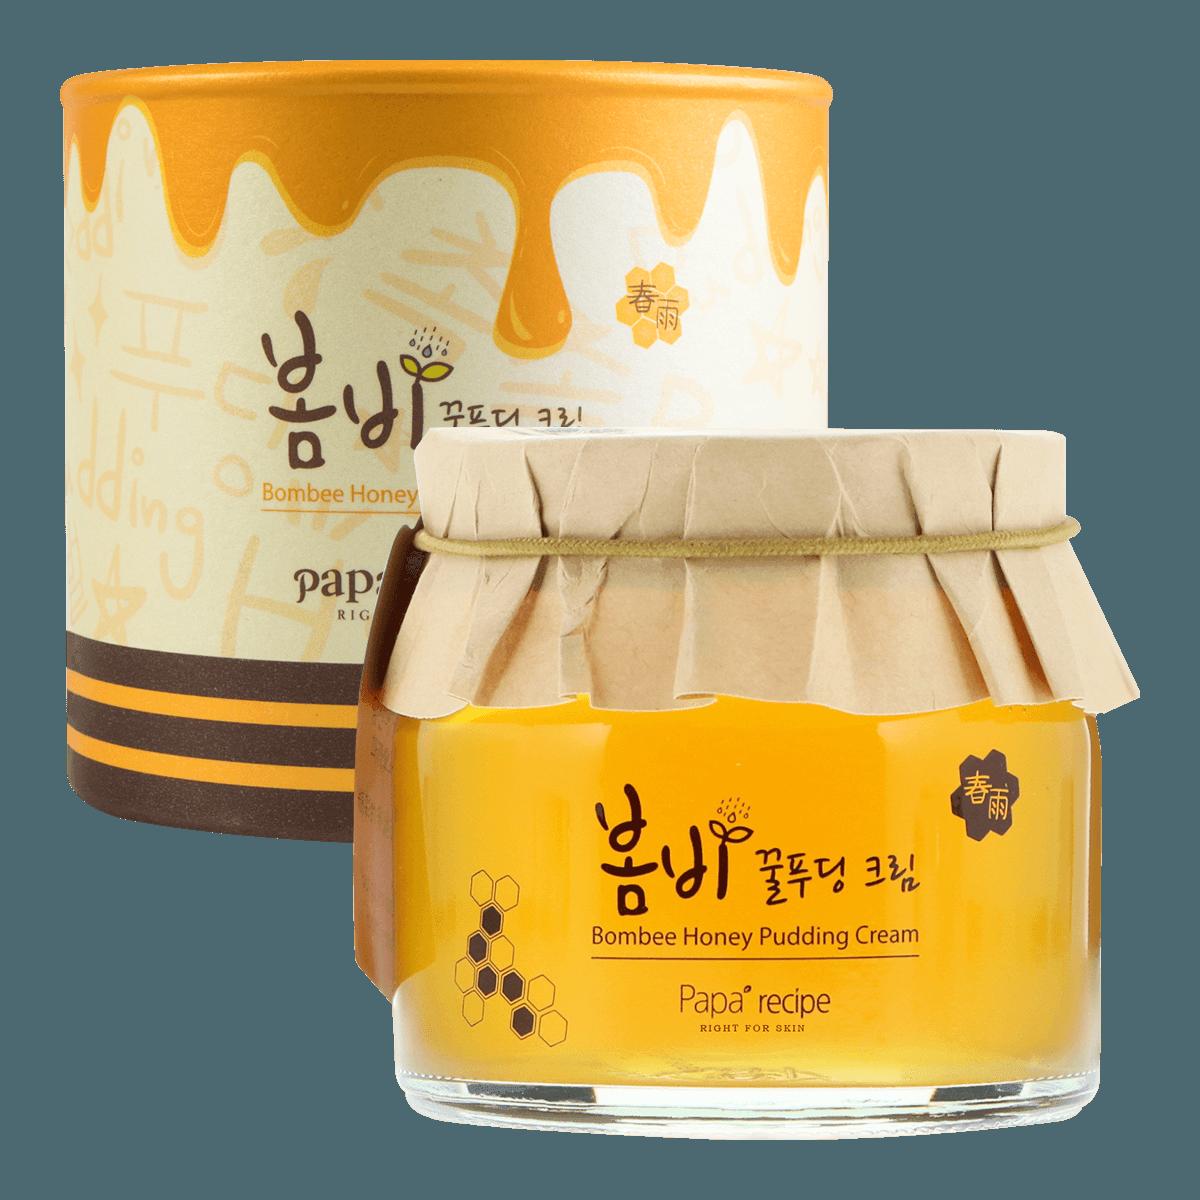 PAPA RECIPE Bombee Honey Pudding Cream 135ml